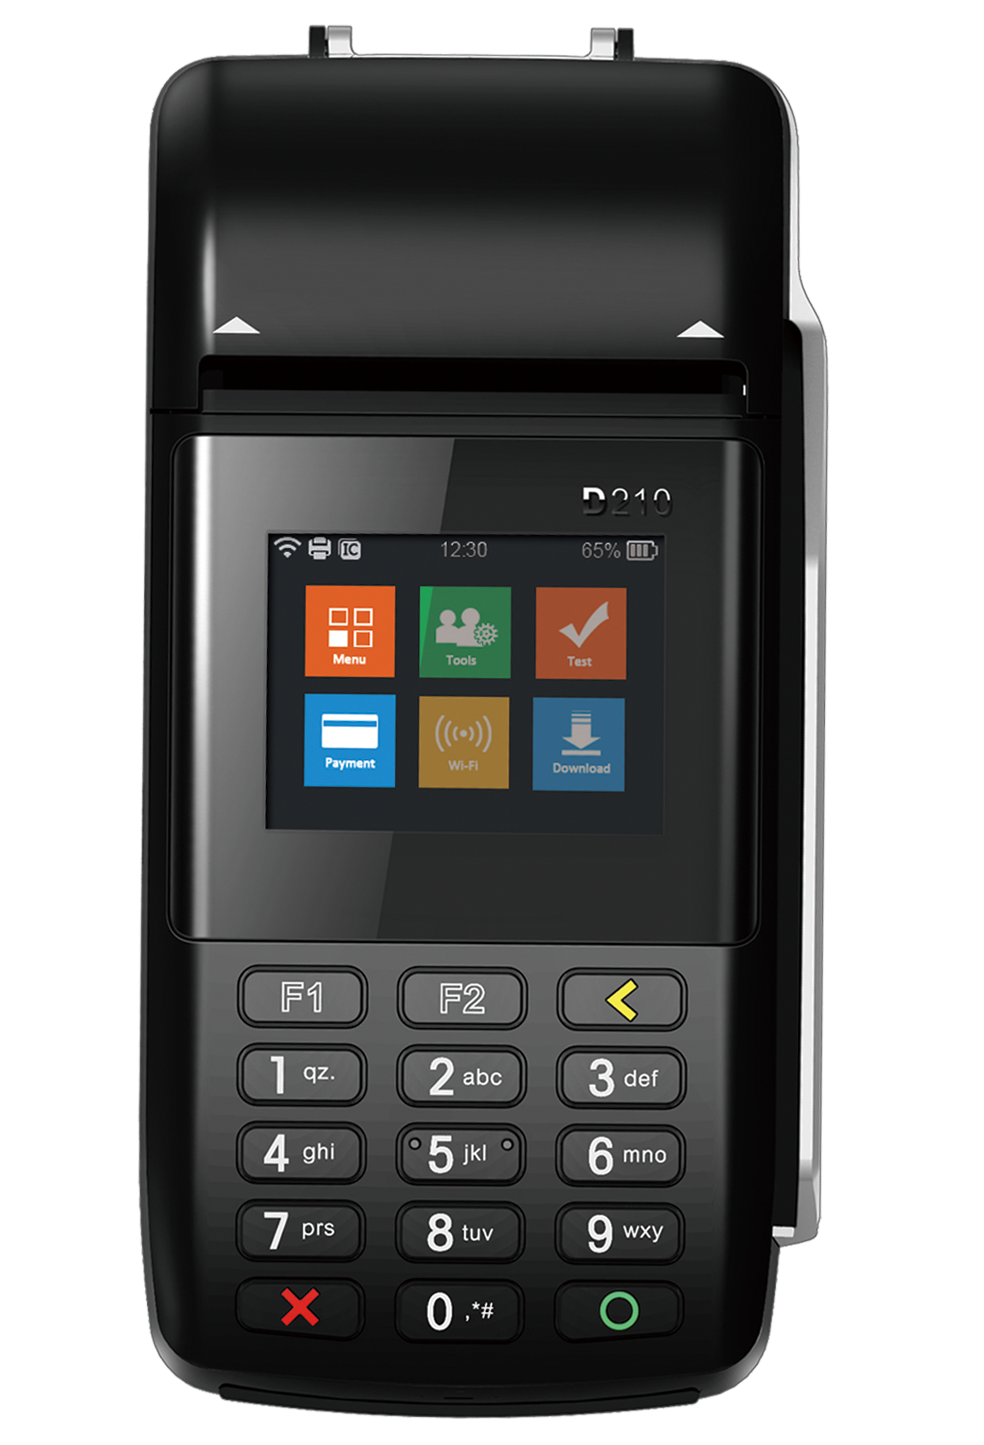 Pax D210 Placement Program Hybrid Paymentsbevo Pos Blog